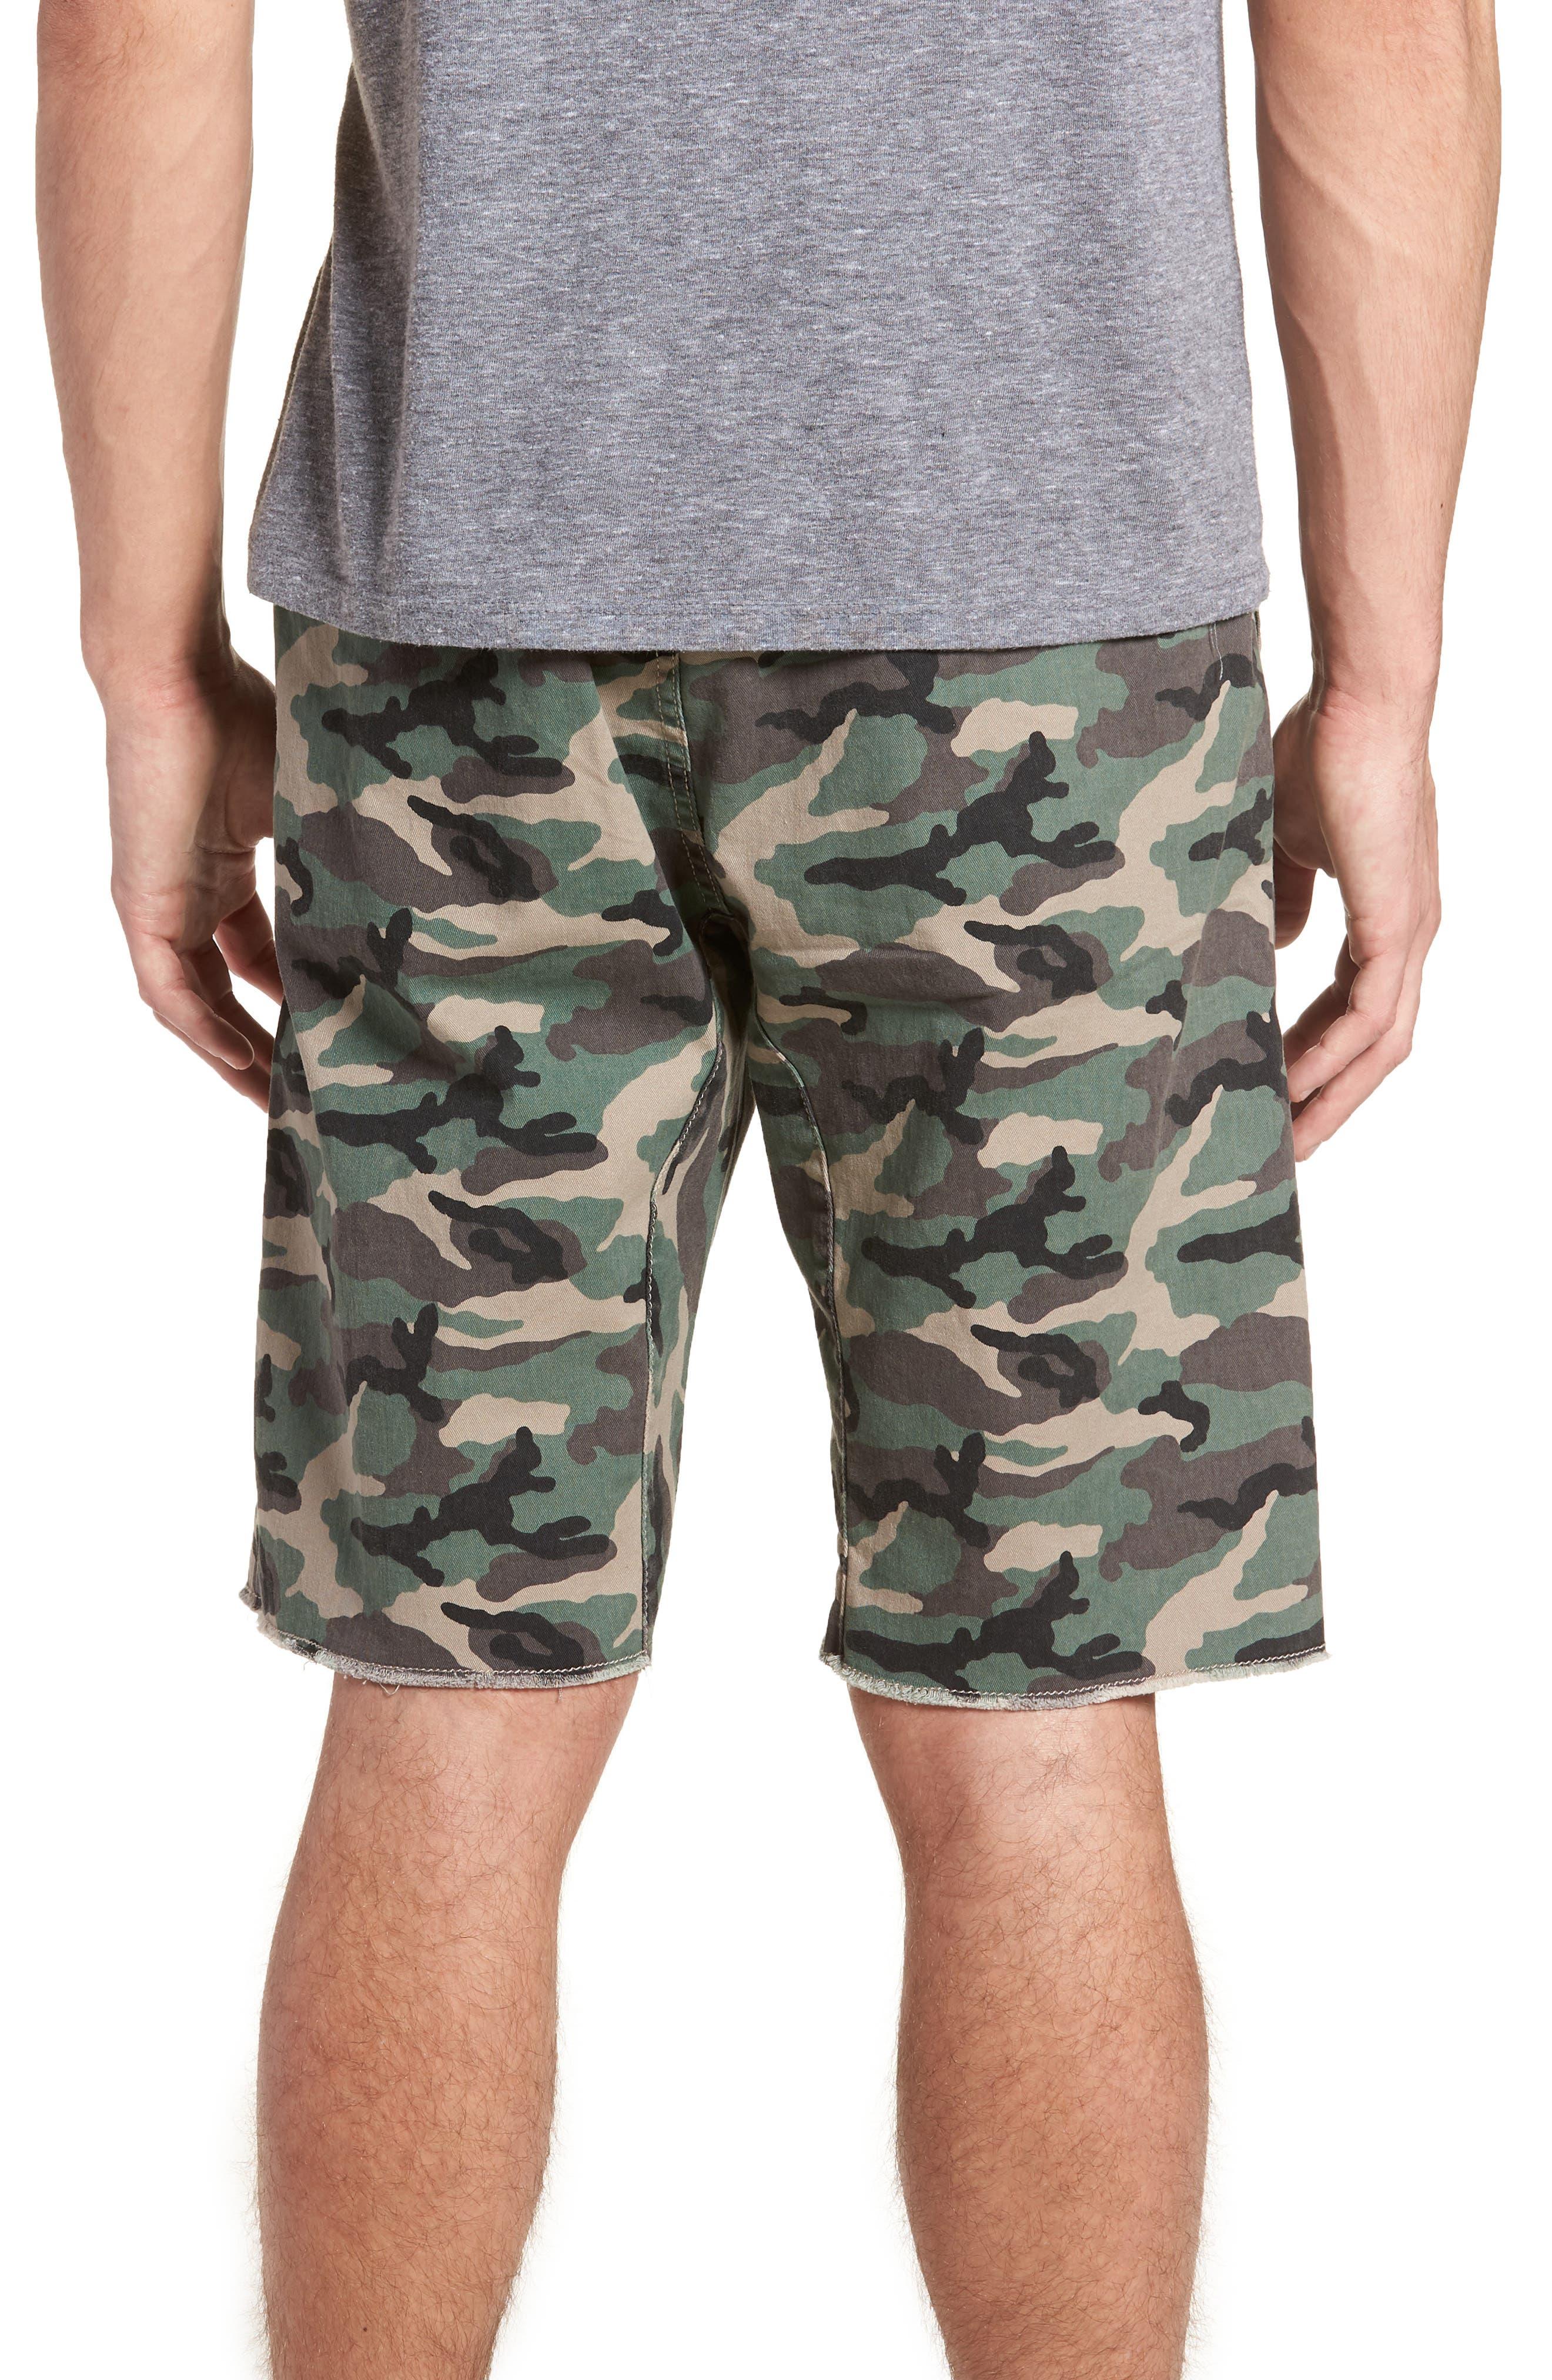 Camo Print Cutoff Twill Shorts,                             Alternate thumbnail 2, color,                             Brown Green Camo